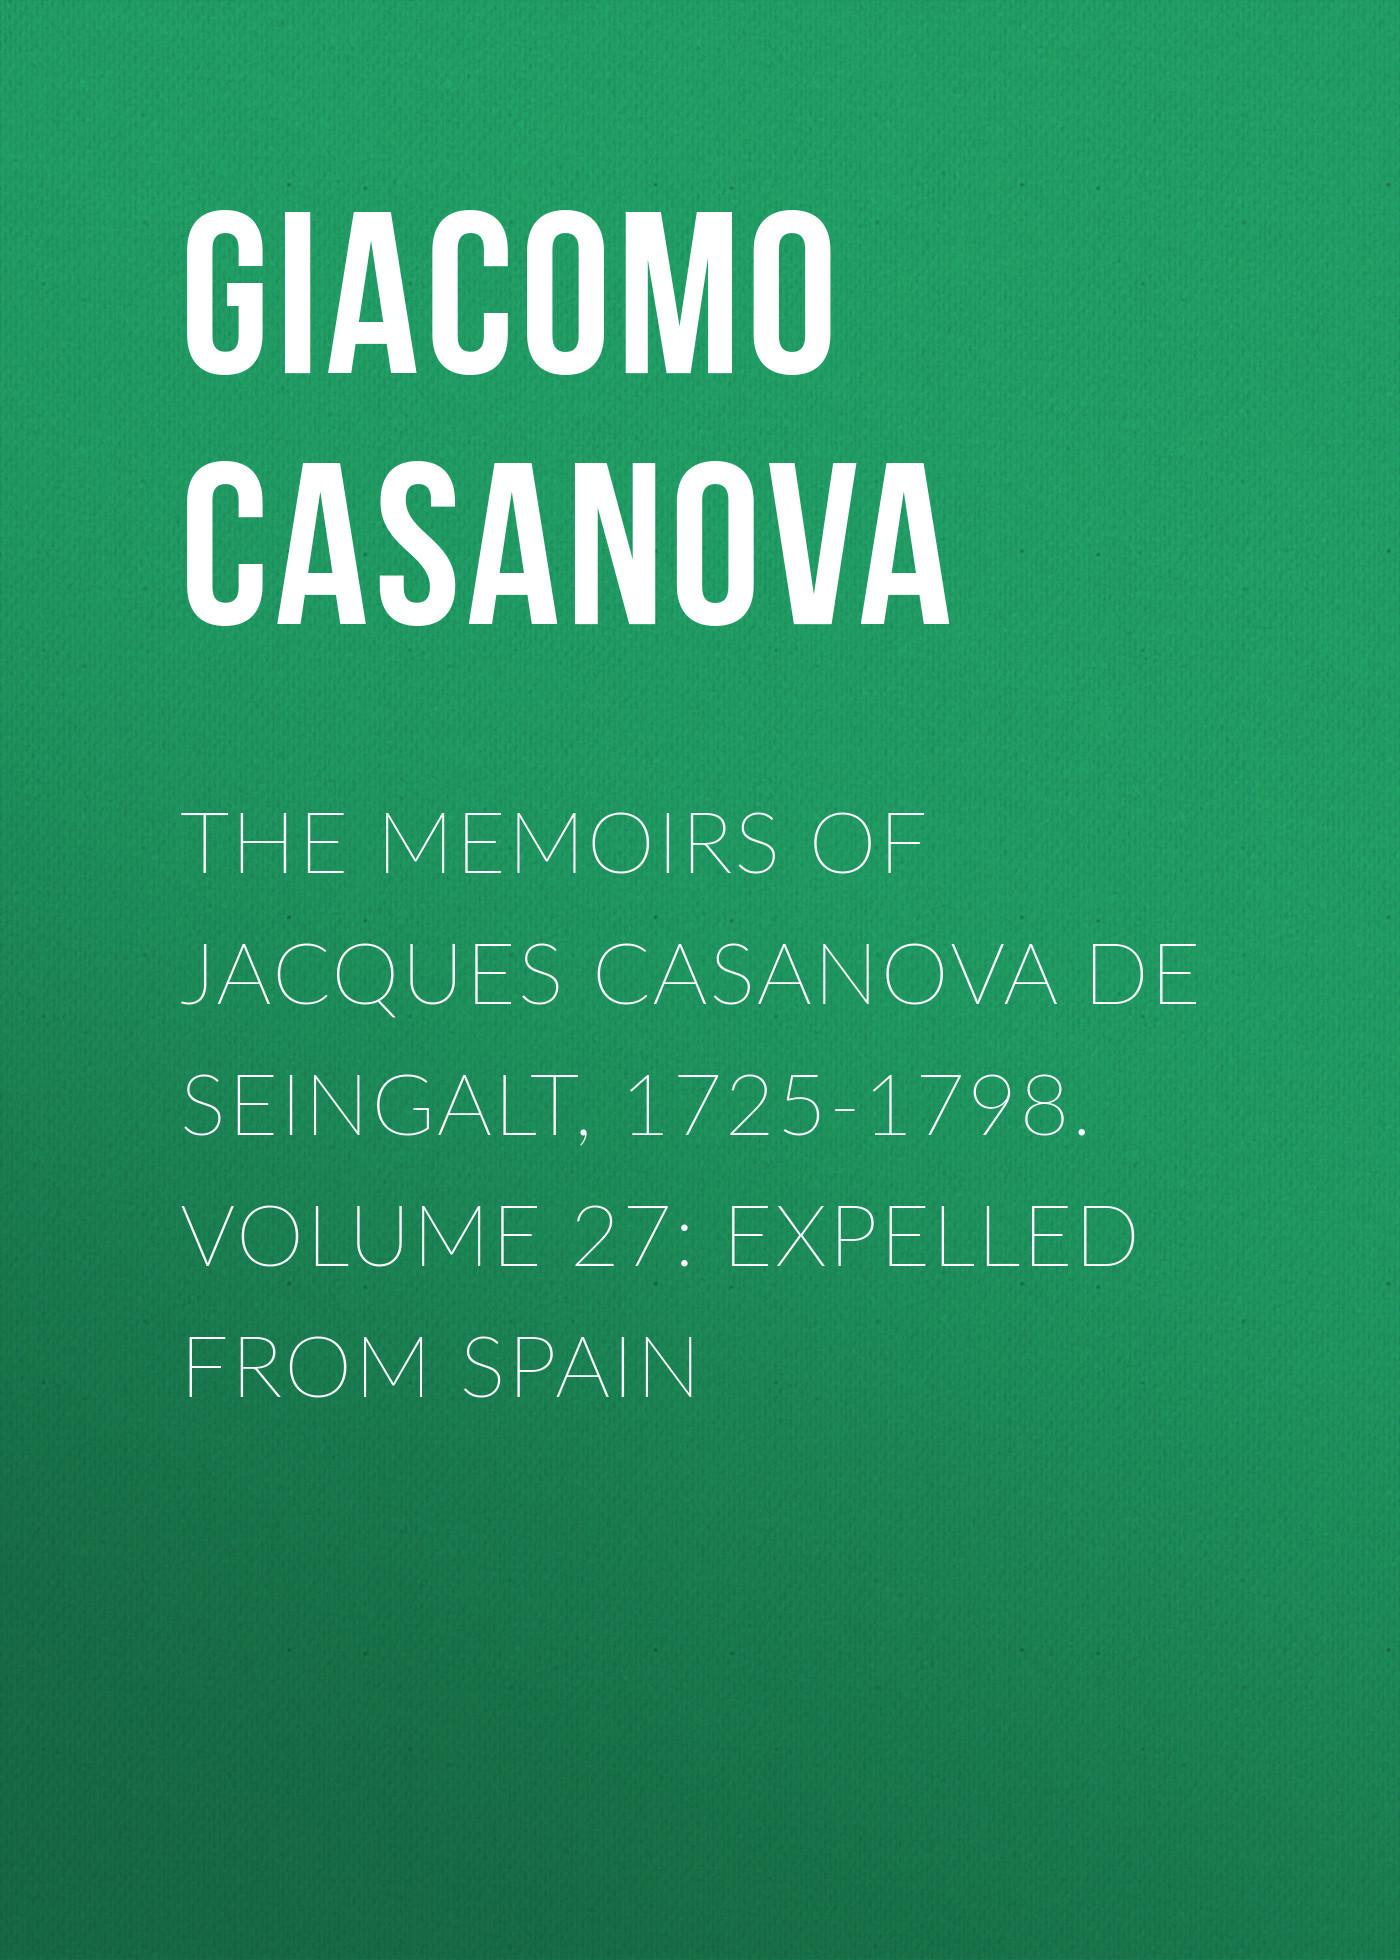 Giacomo Casanova The Memoirs of Jacques Casanova de Seingalt, 1725-1798. Volume 27: Expelled from Spain giacomo casanova the memoirs of jacques casanova de seingalt 1725 1798 volume 17 return to italy